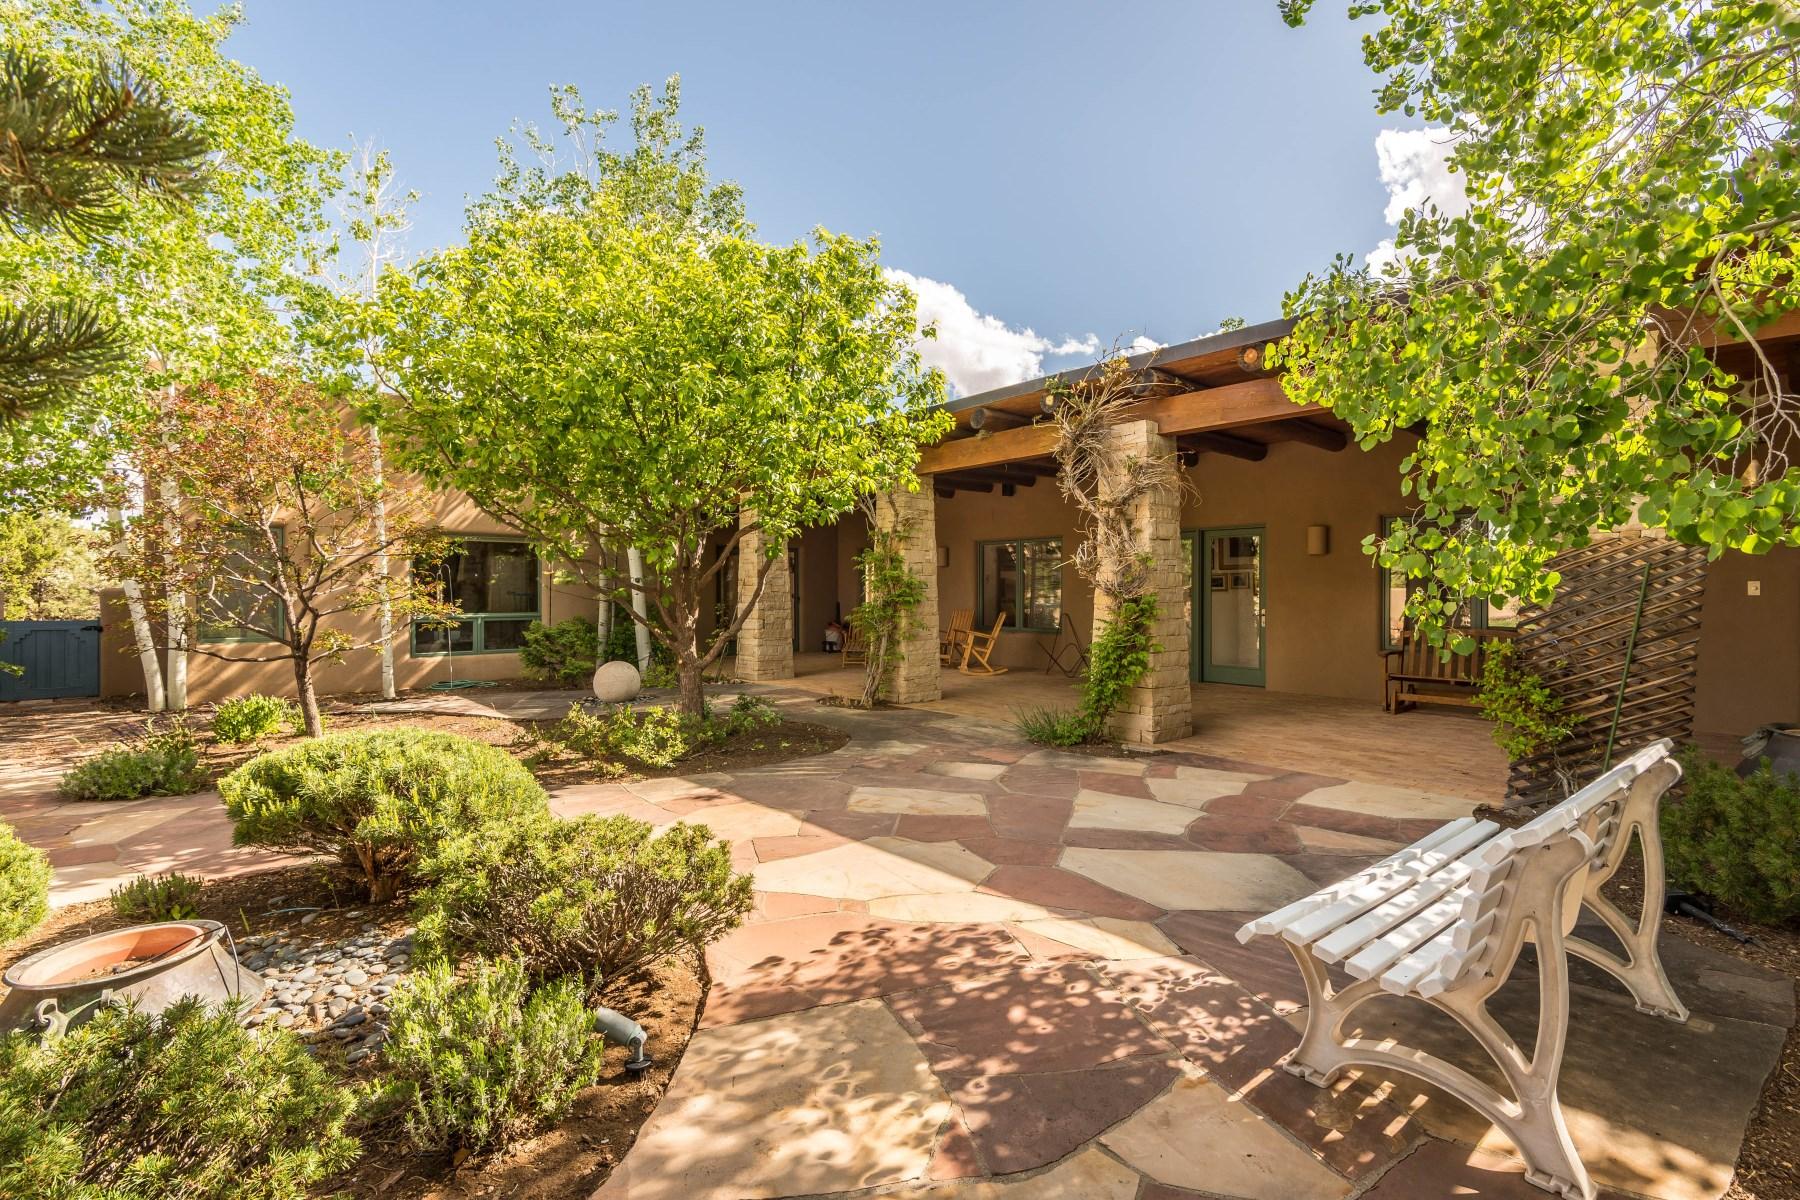 Single Family Home for Sale at 3 Sierra Rosa Loop Las Campanas & Los Santeros, Santa Fe, New Mexico, 87506 United States